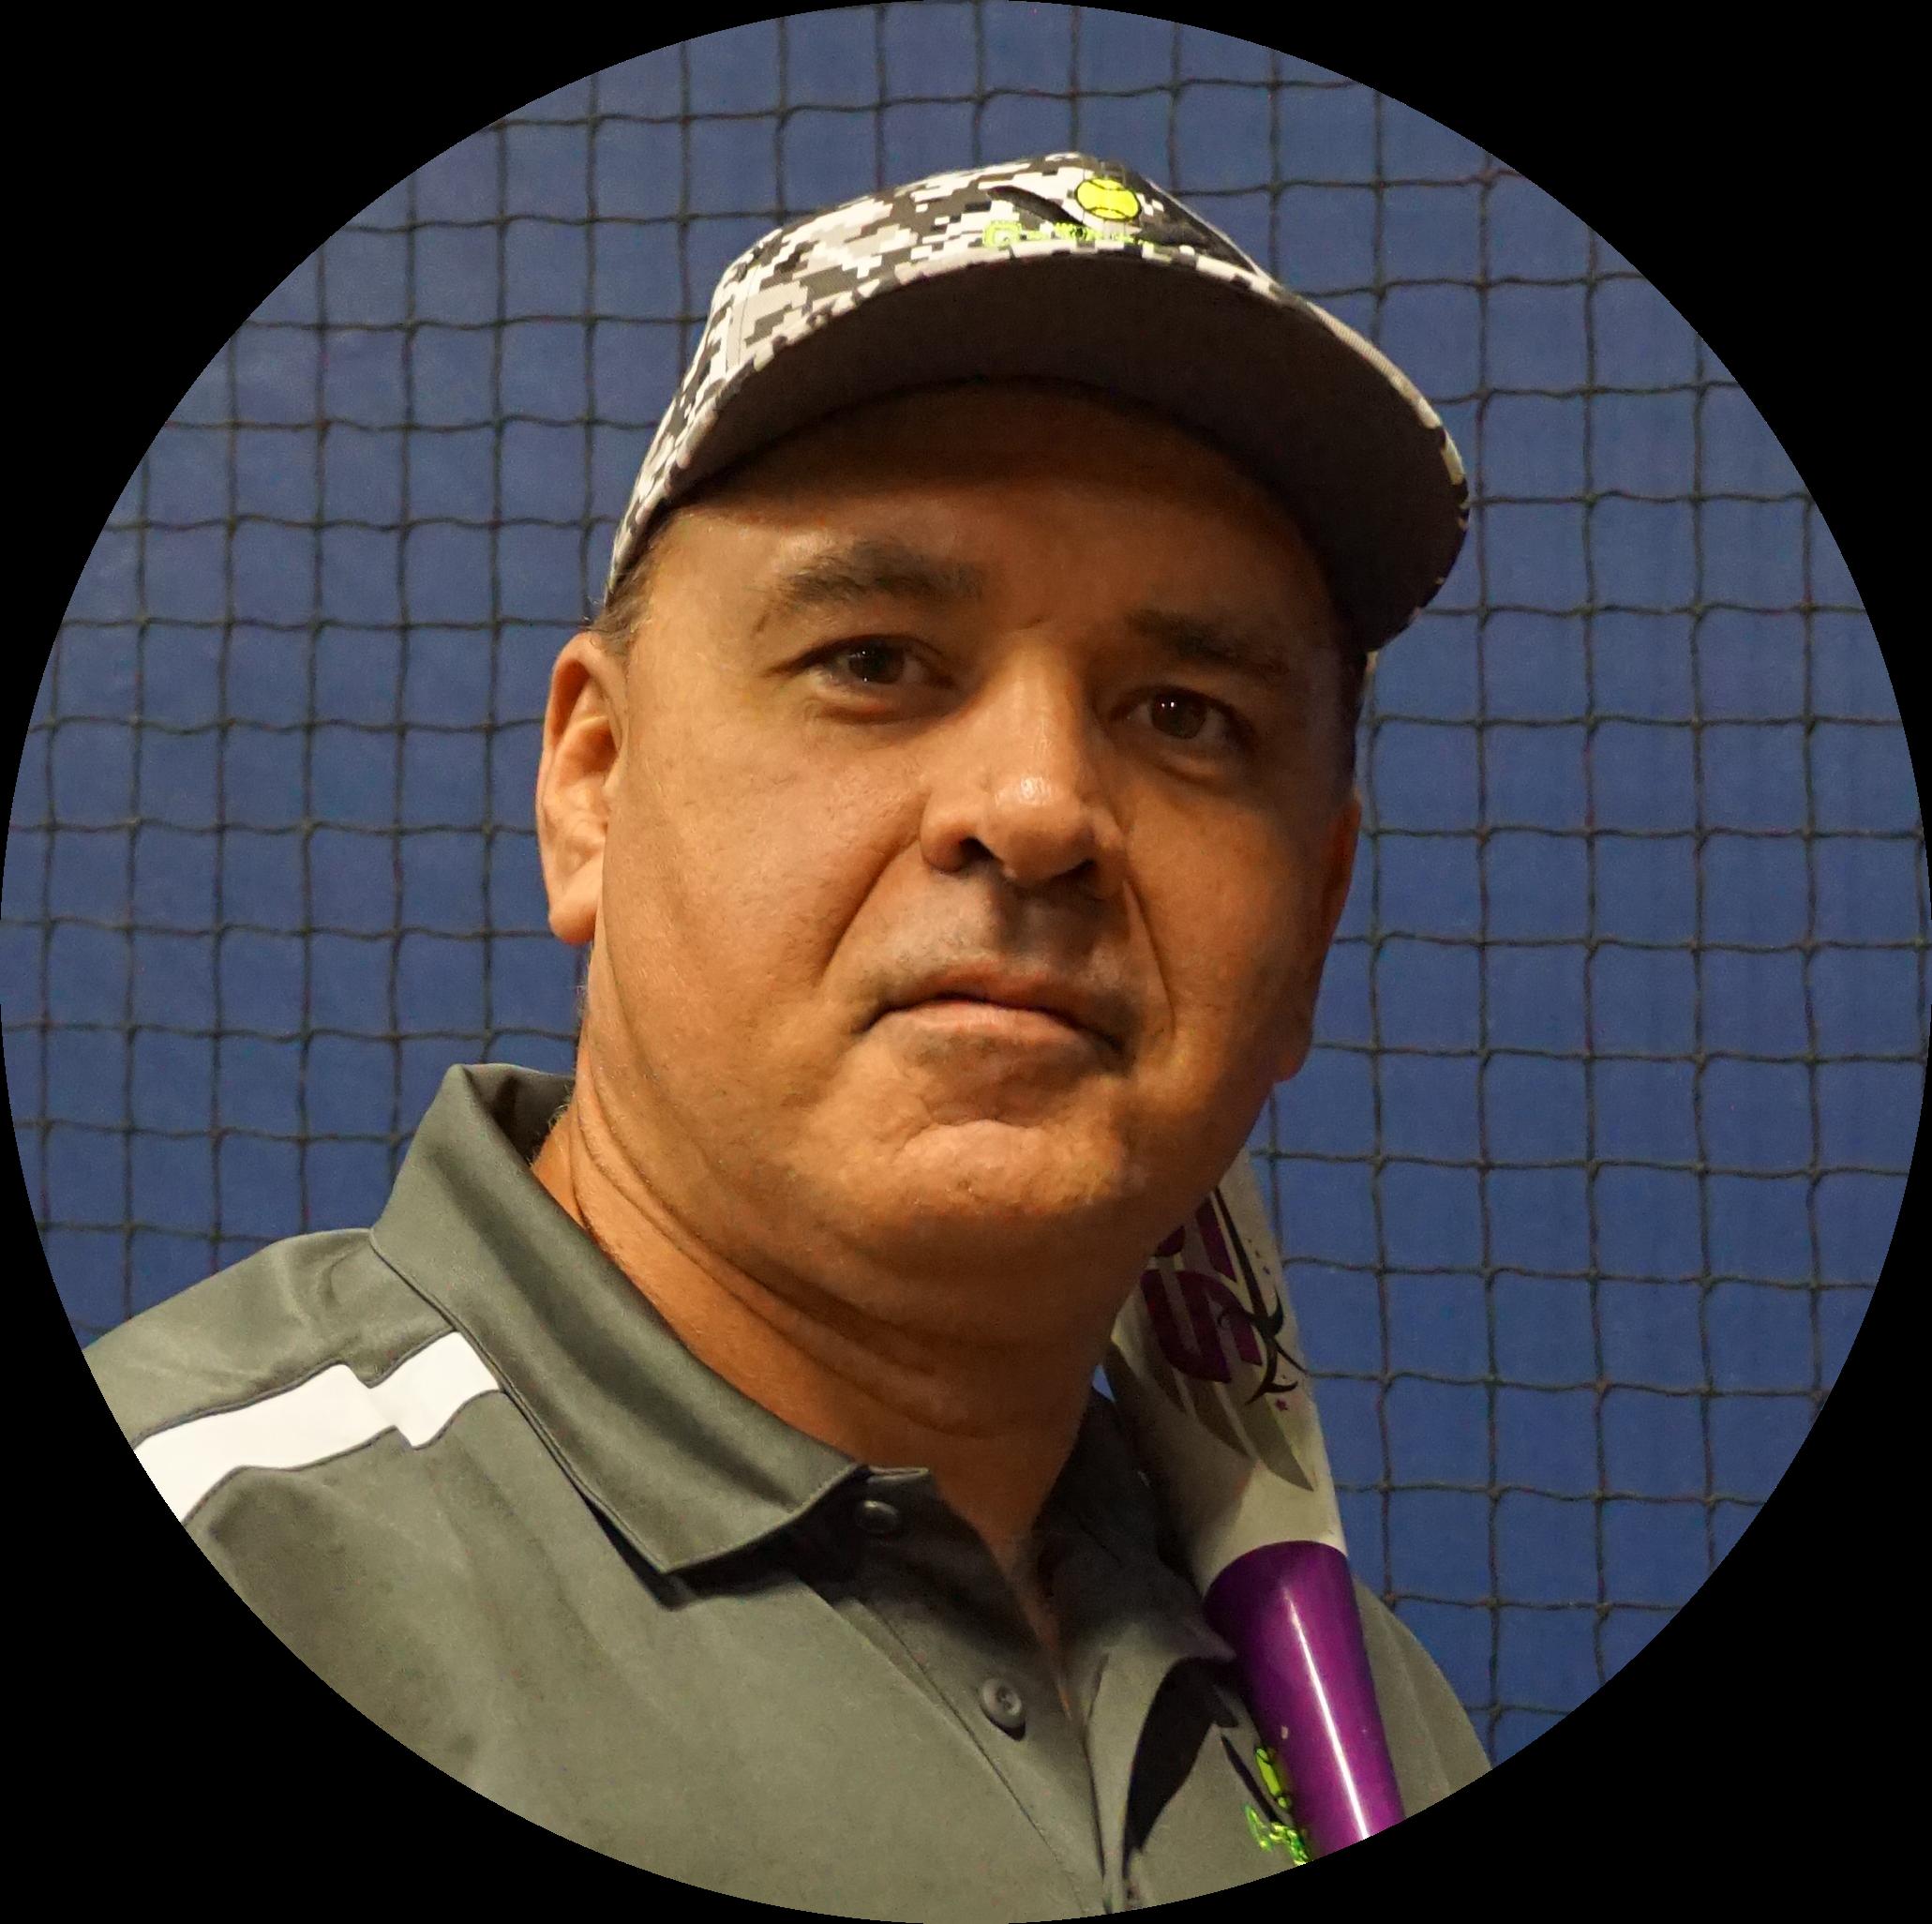 STEVE VALADEZ | INVENTOR OF C-WUH